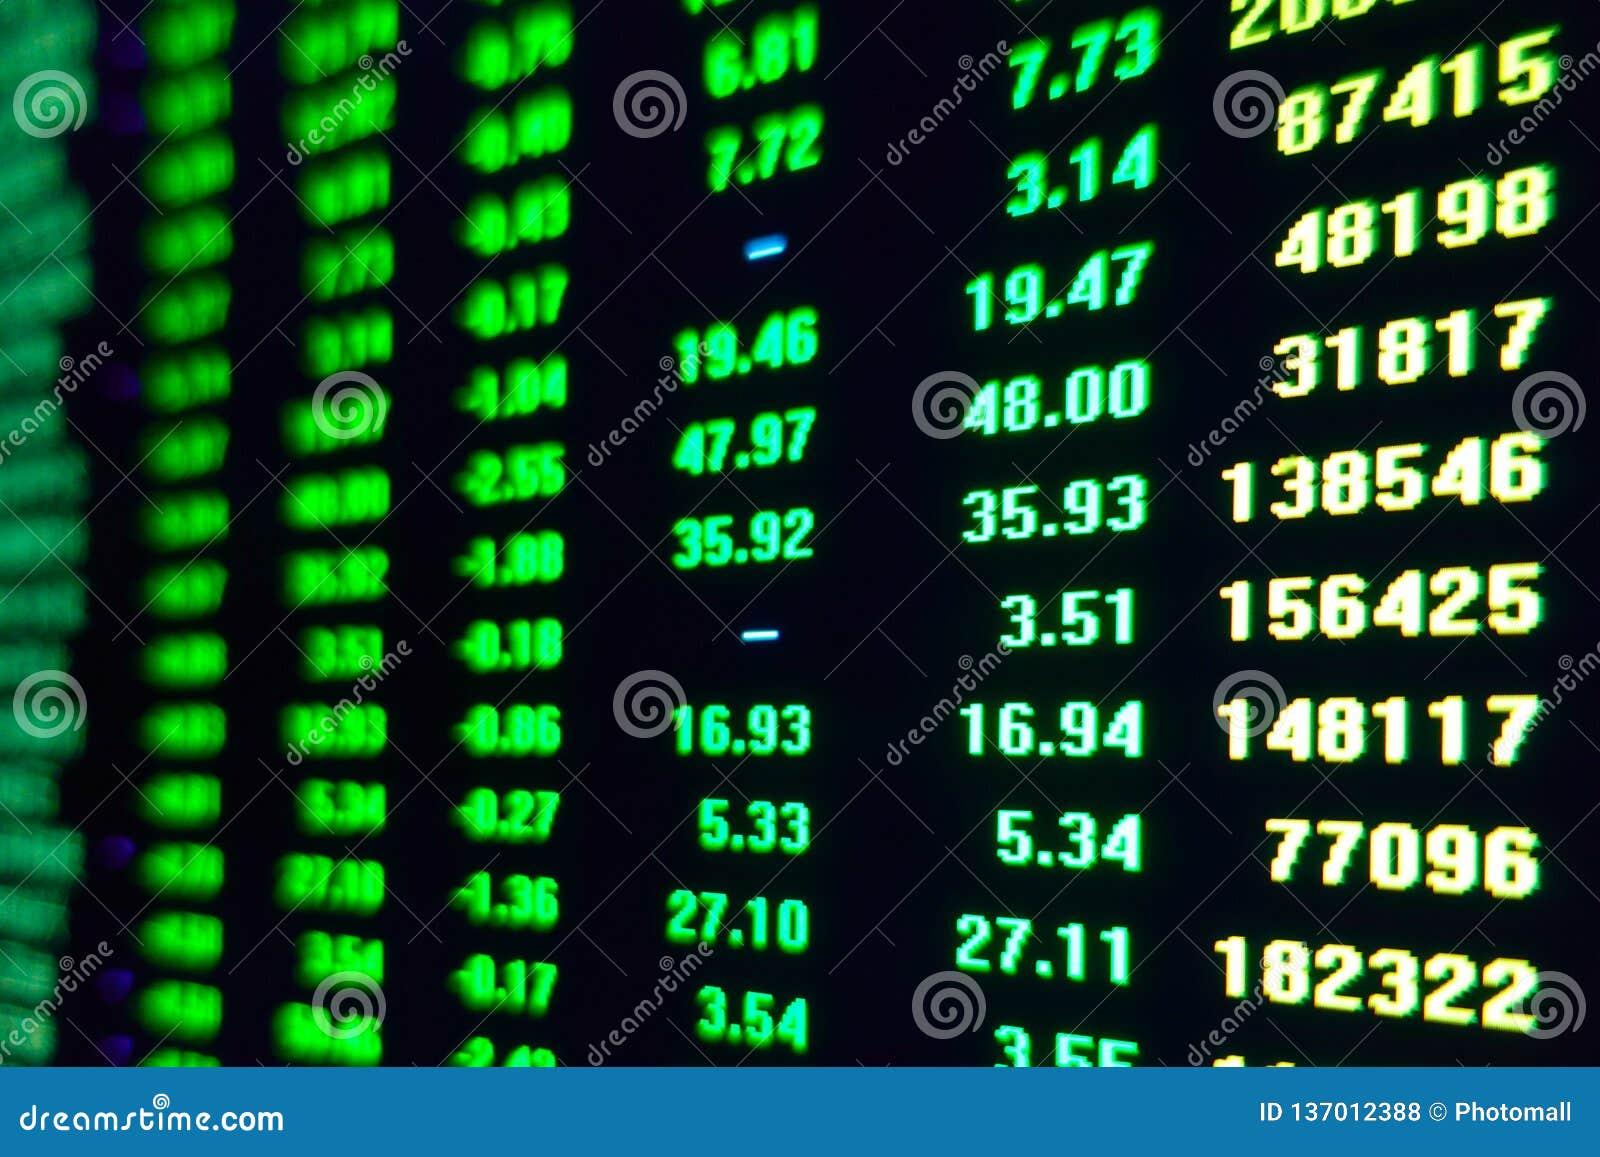 Stock exchange market trading price